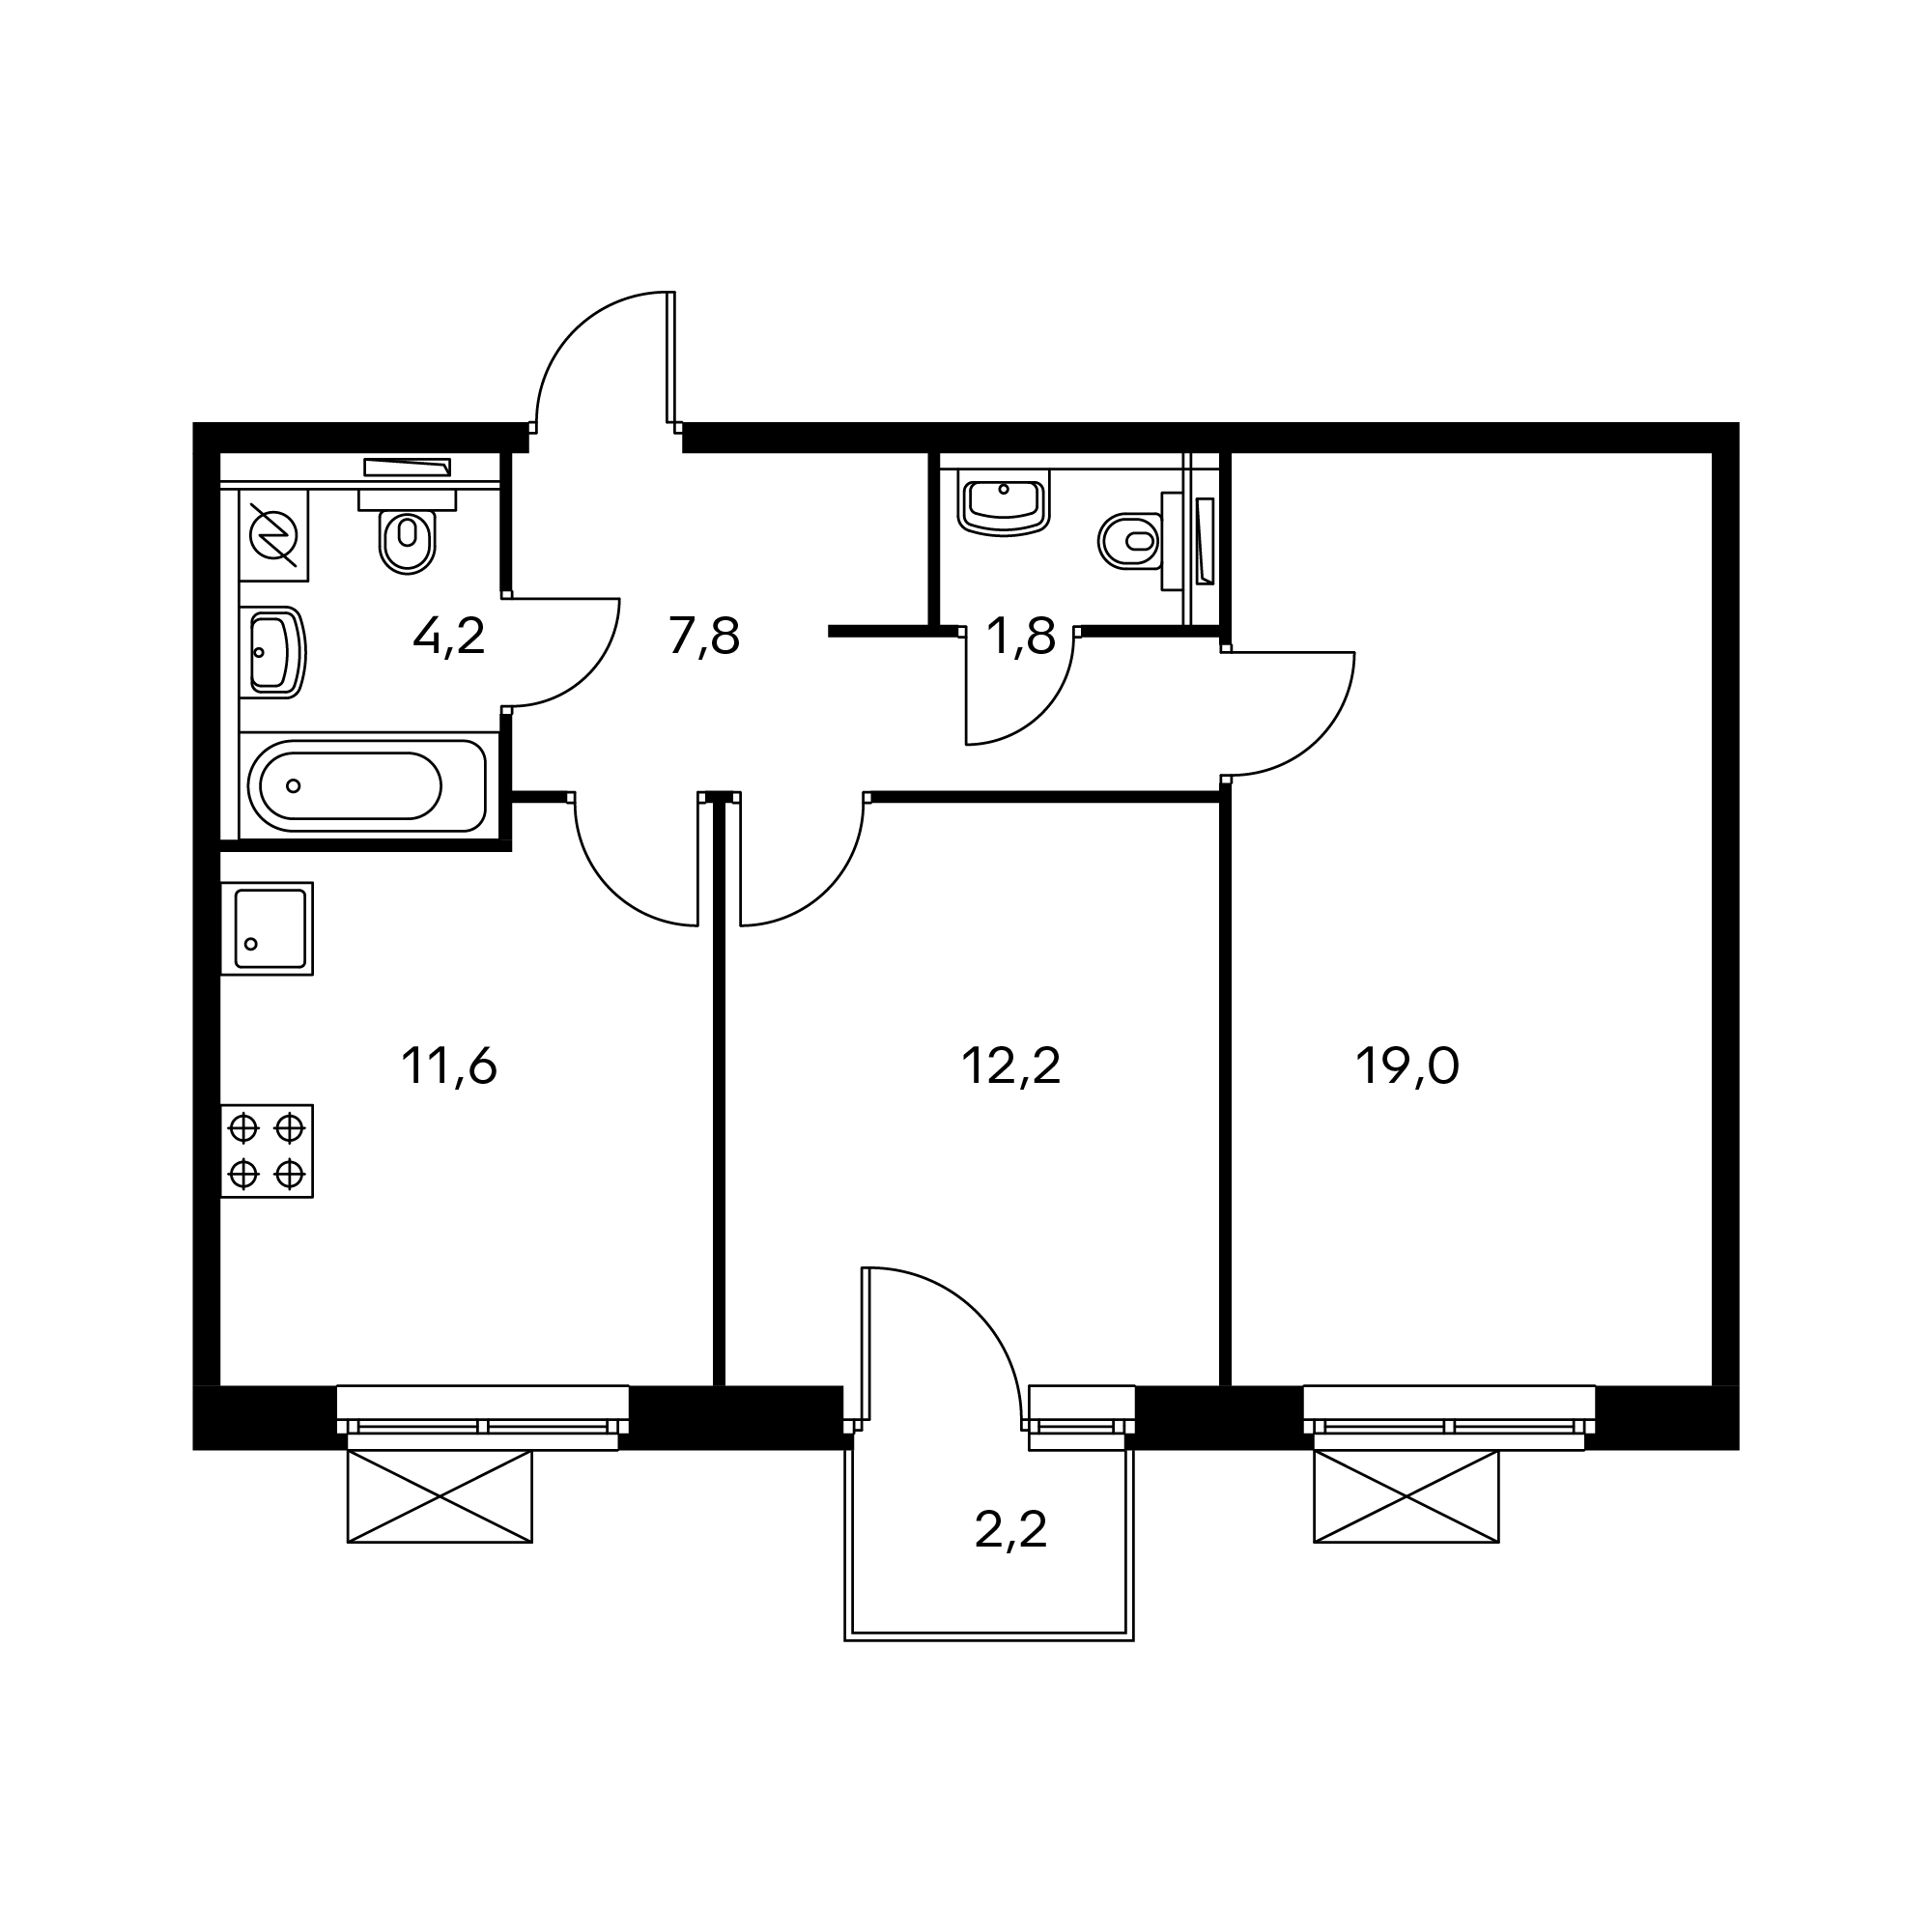 2KM6_9.9-1_B(2,2)_3